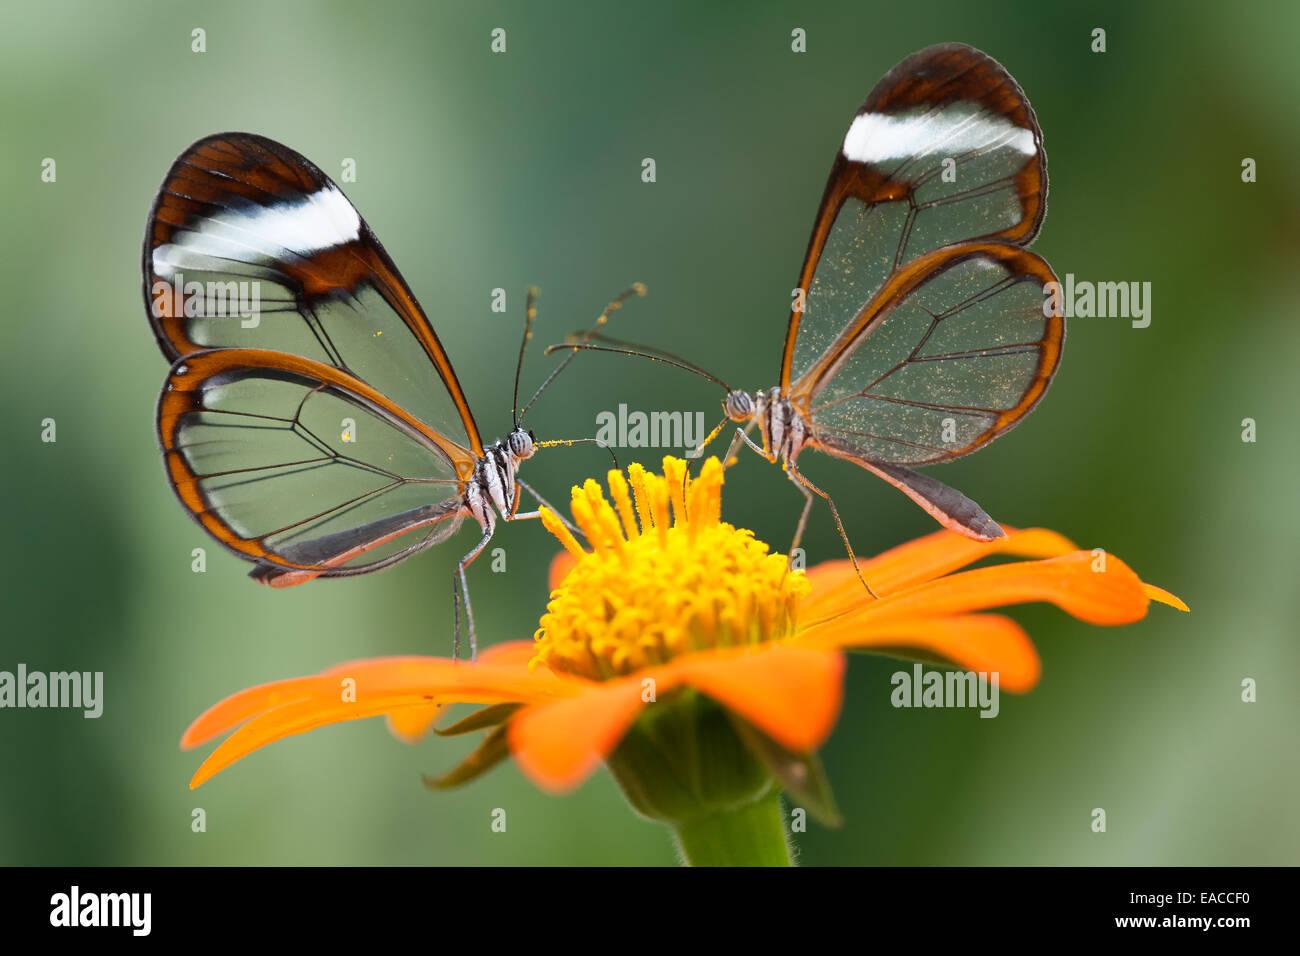 "Paar ""Glas Wing"" Schmetterlinge, Fütterung in North Somerset Butterfly House Stockbild"